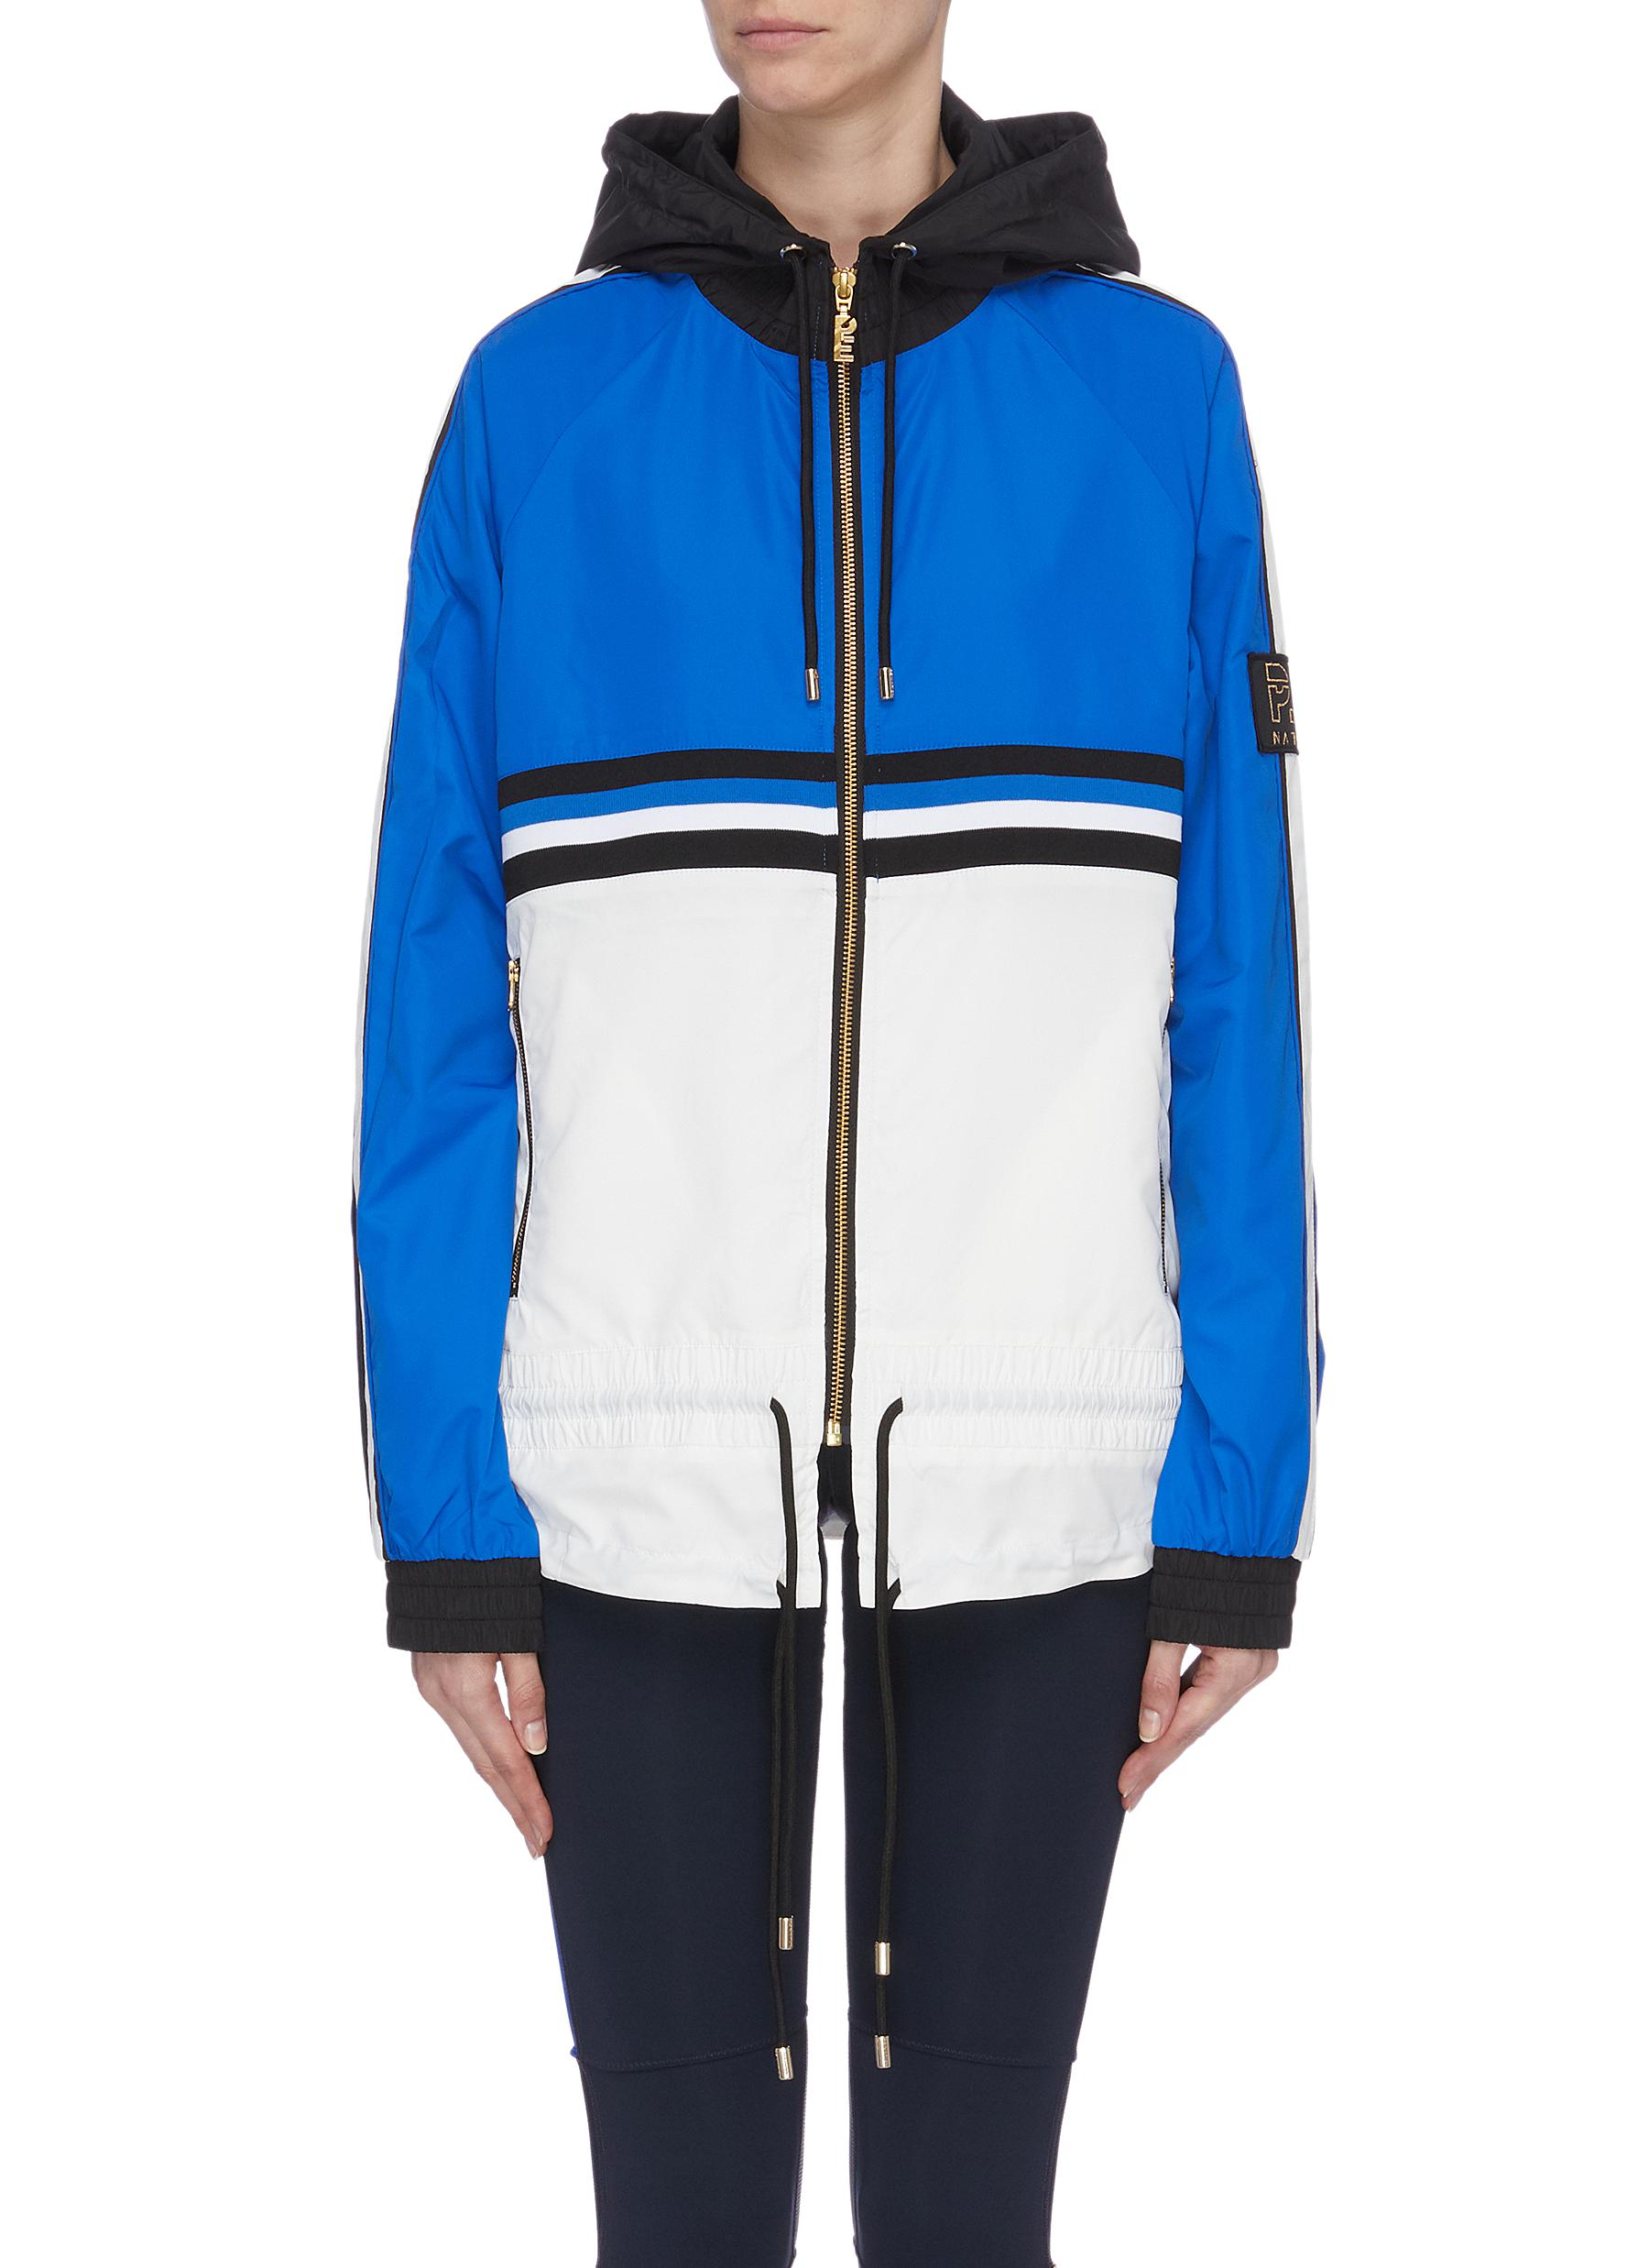 Man Down drawstring waist colourblock hooded jacket by P.E Nation